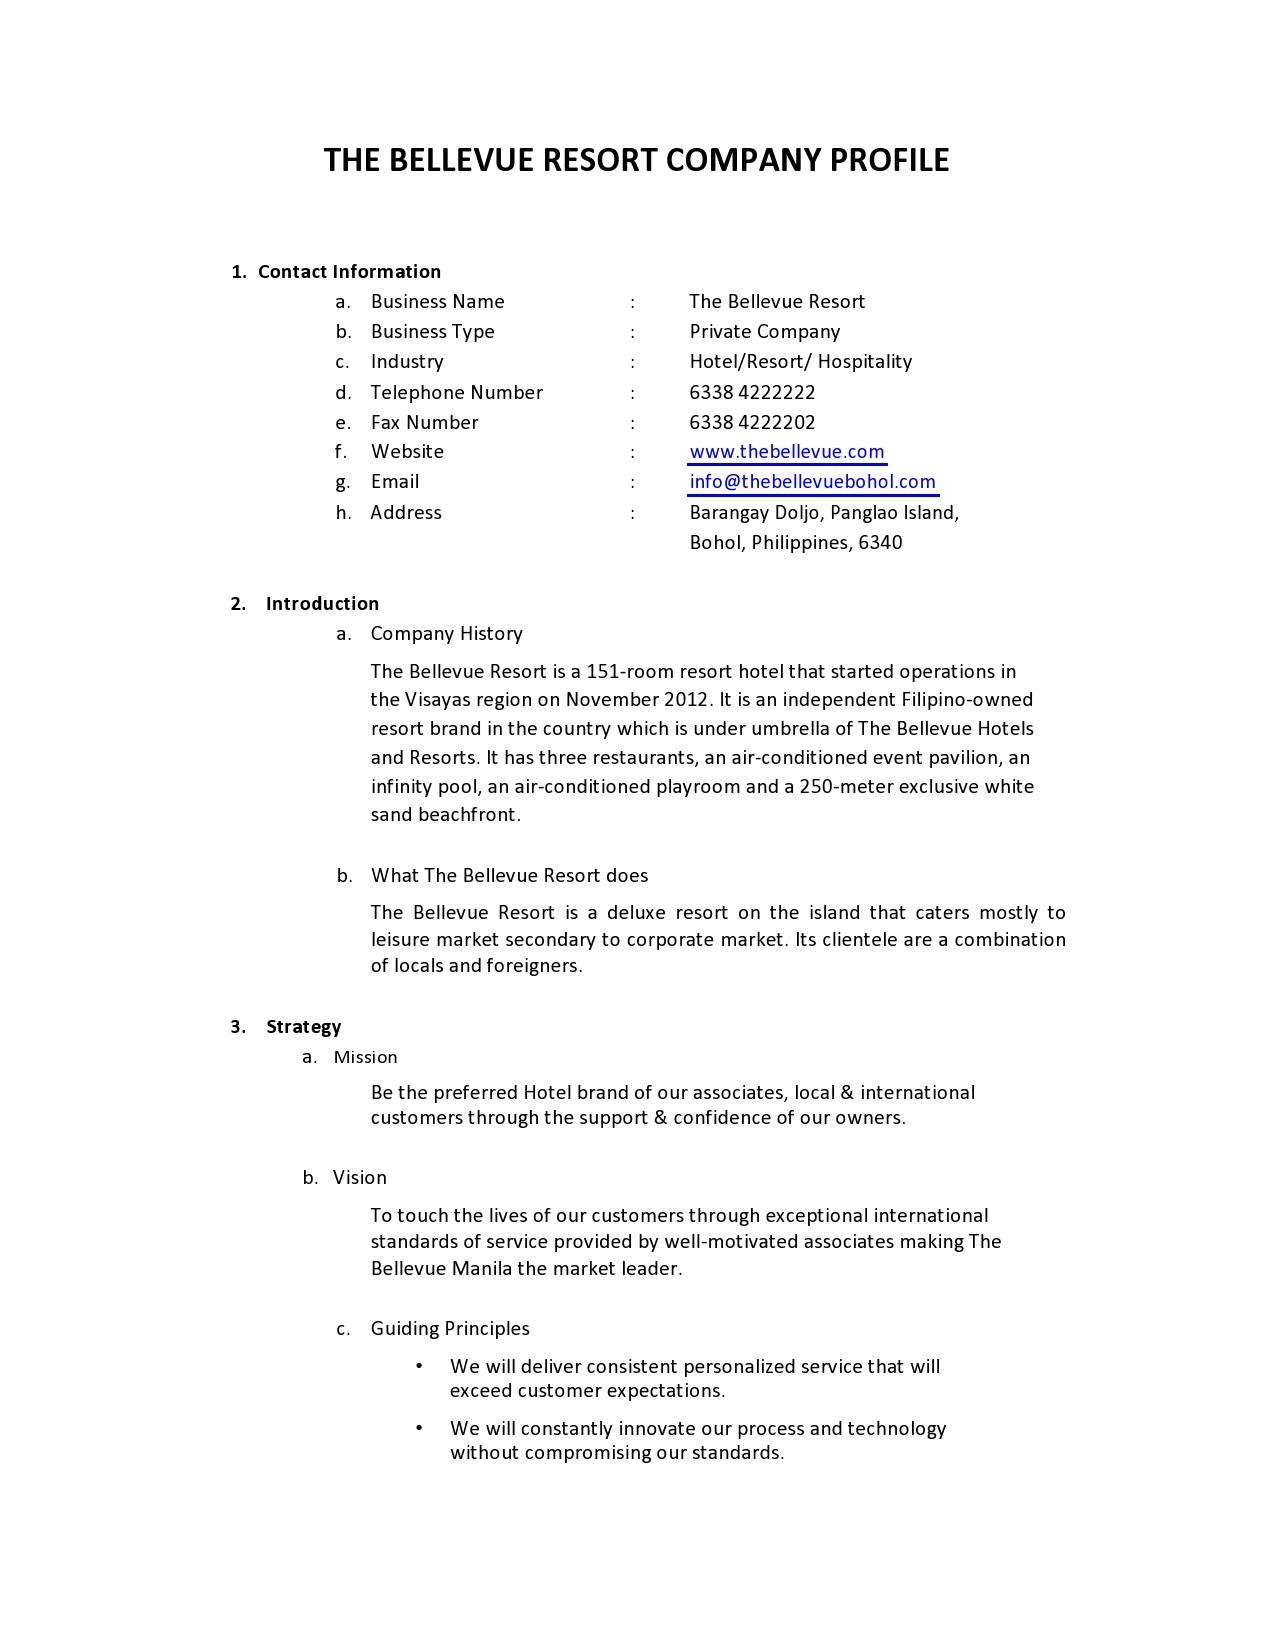 Free company profile template 43